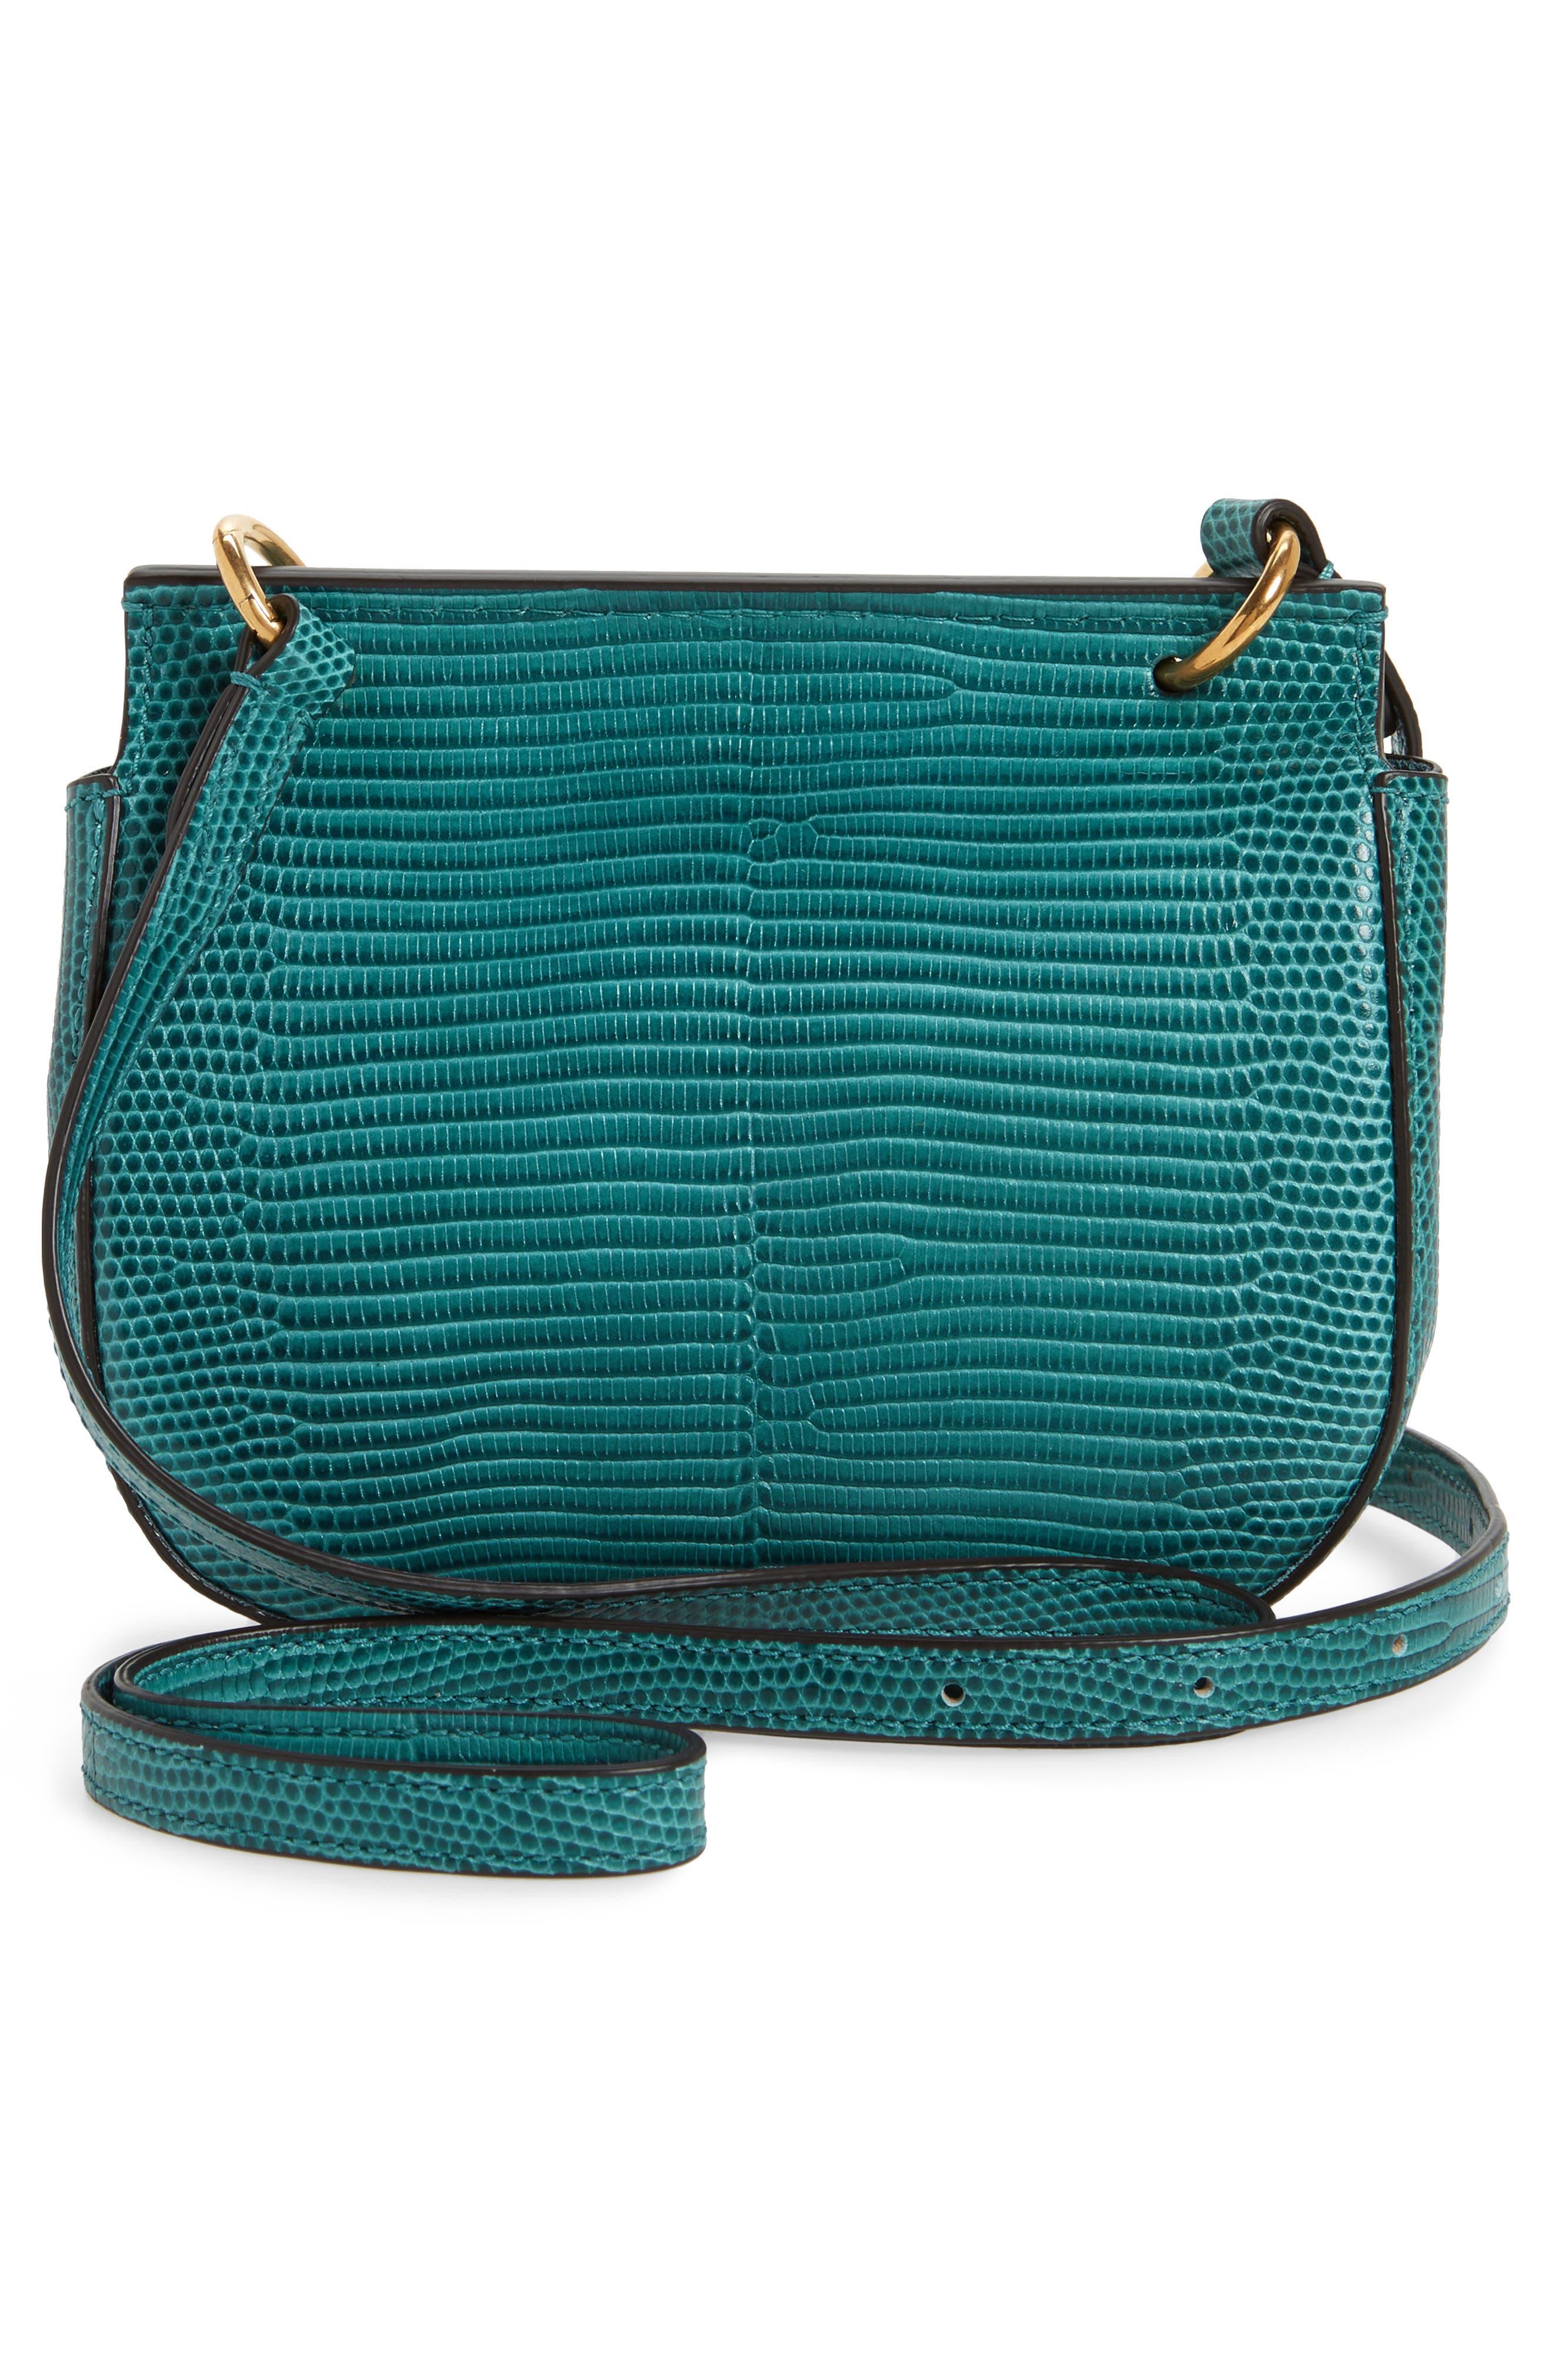 Alternate Image 3  - Mulberry Mini Amberley Reptile Embossed Leather Crossbody Bag